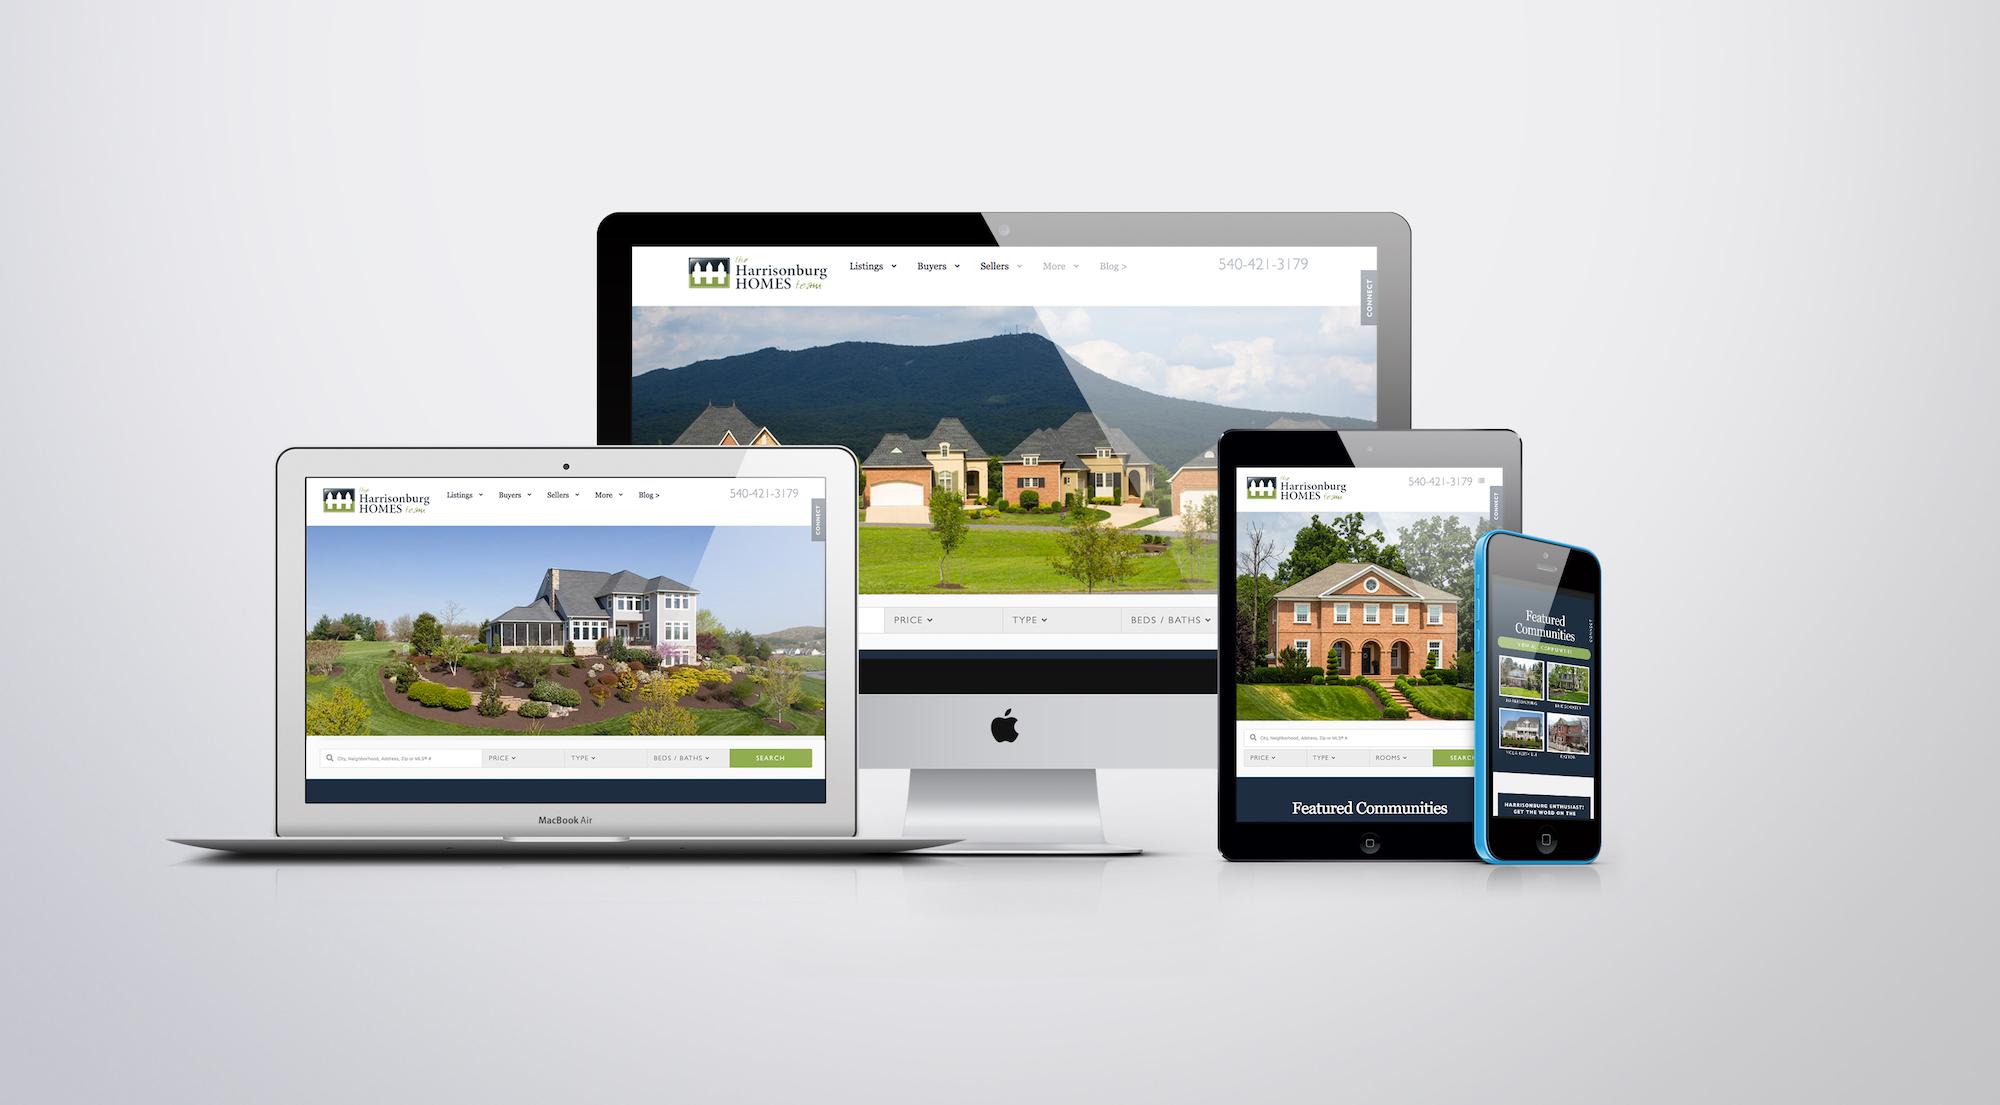 New Real Estate Site Launch   HarrisonburgHomes.com   The Harrisonburg Homes Team @ Kline May Realty